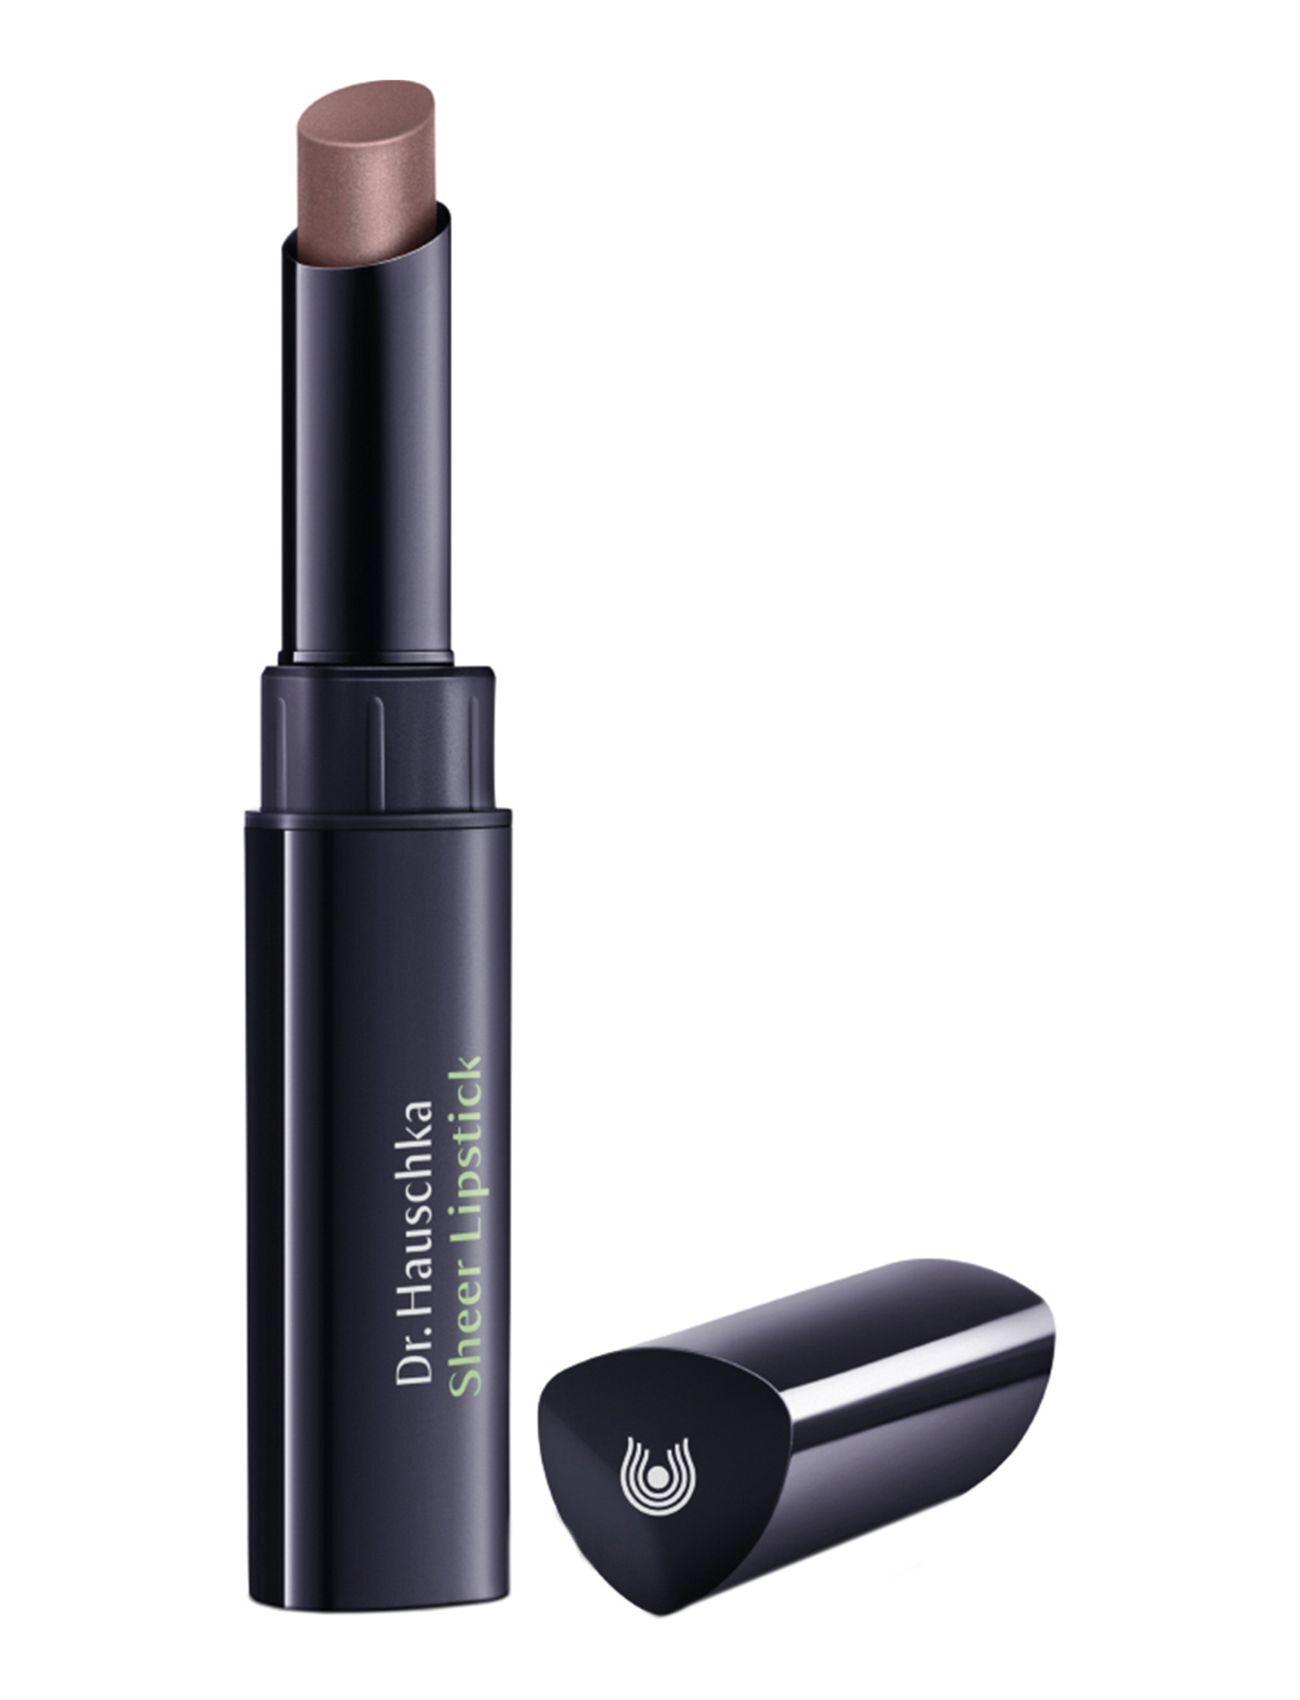 Dr. Hauschka Sheer Lipstick 05 Zambra